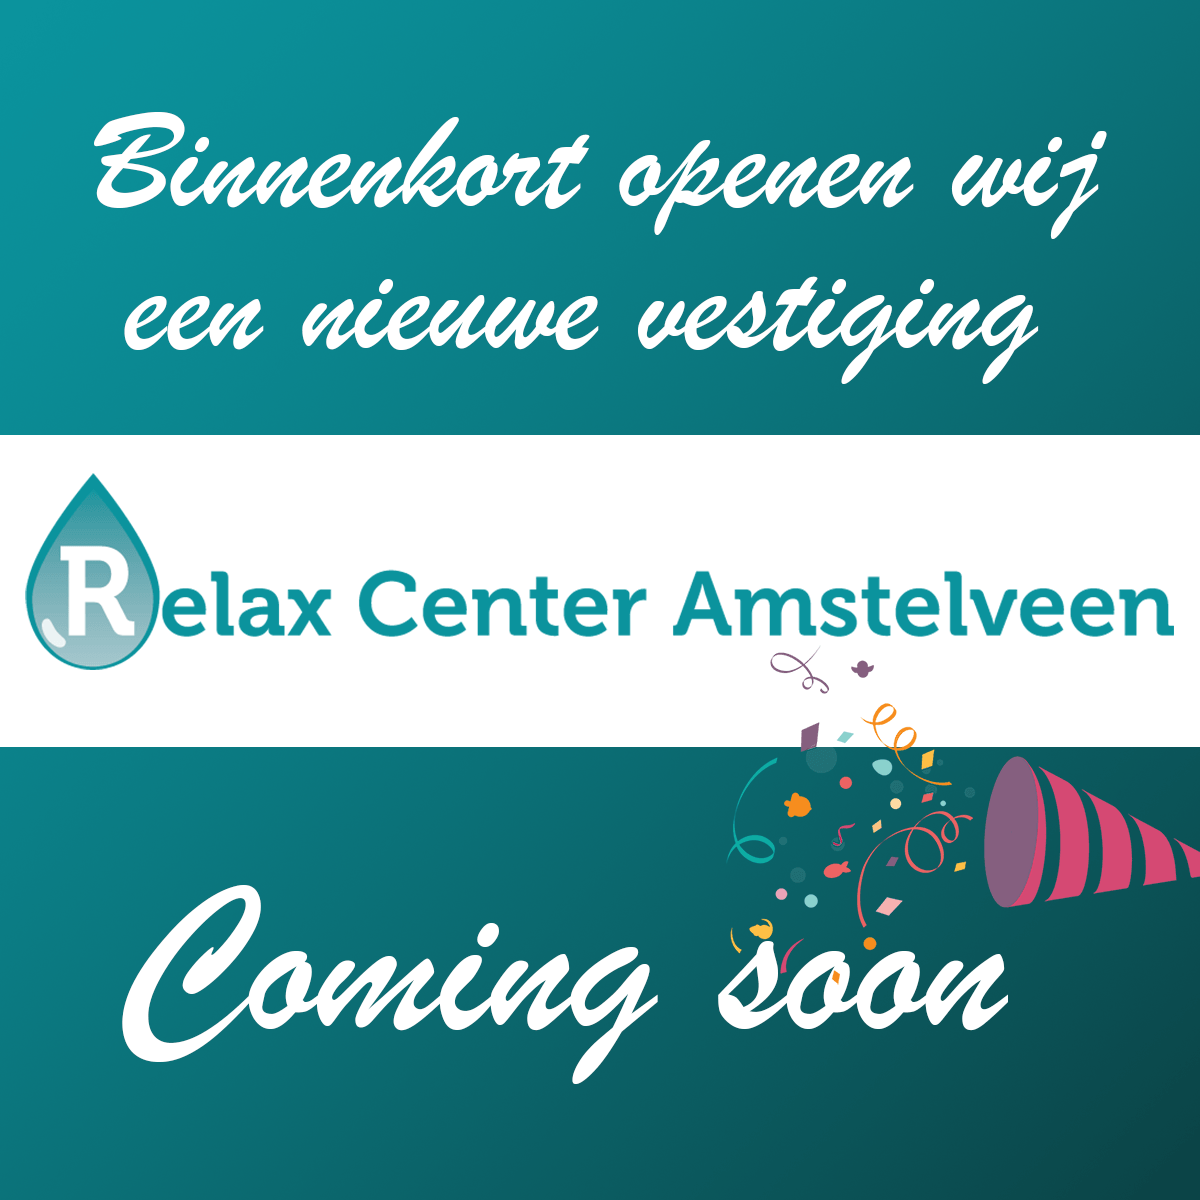 Relax Center Amstelveen